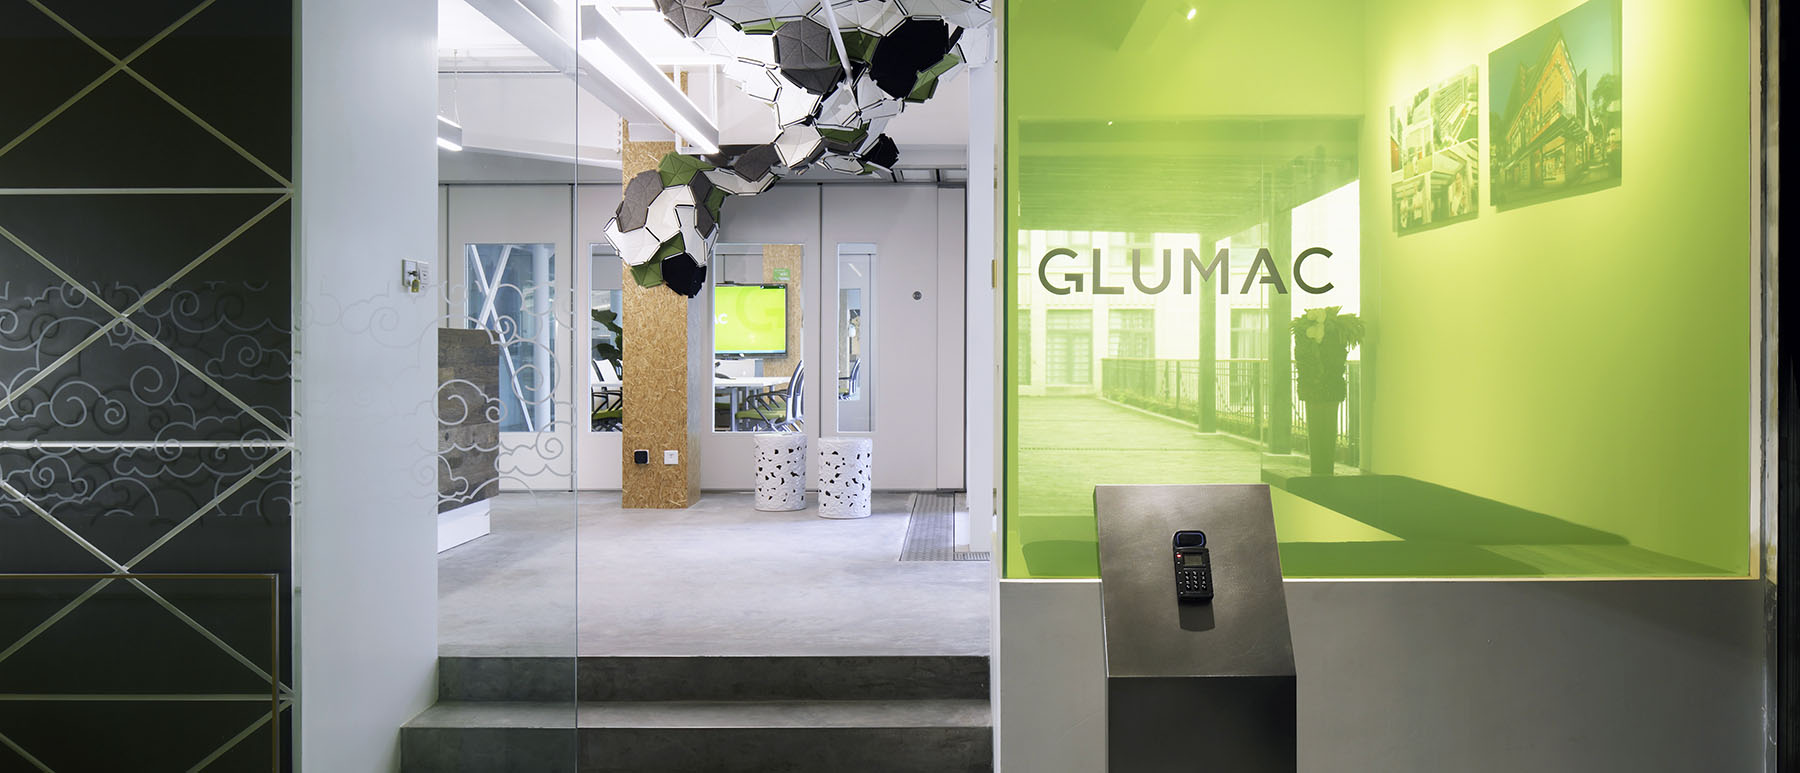 Glumac Shanghai Office Enterance, Living Building Challenge